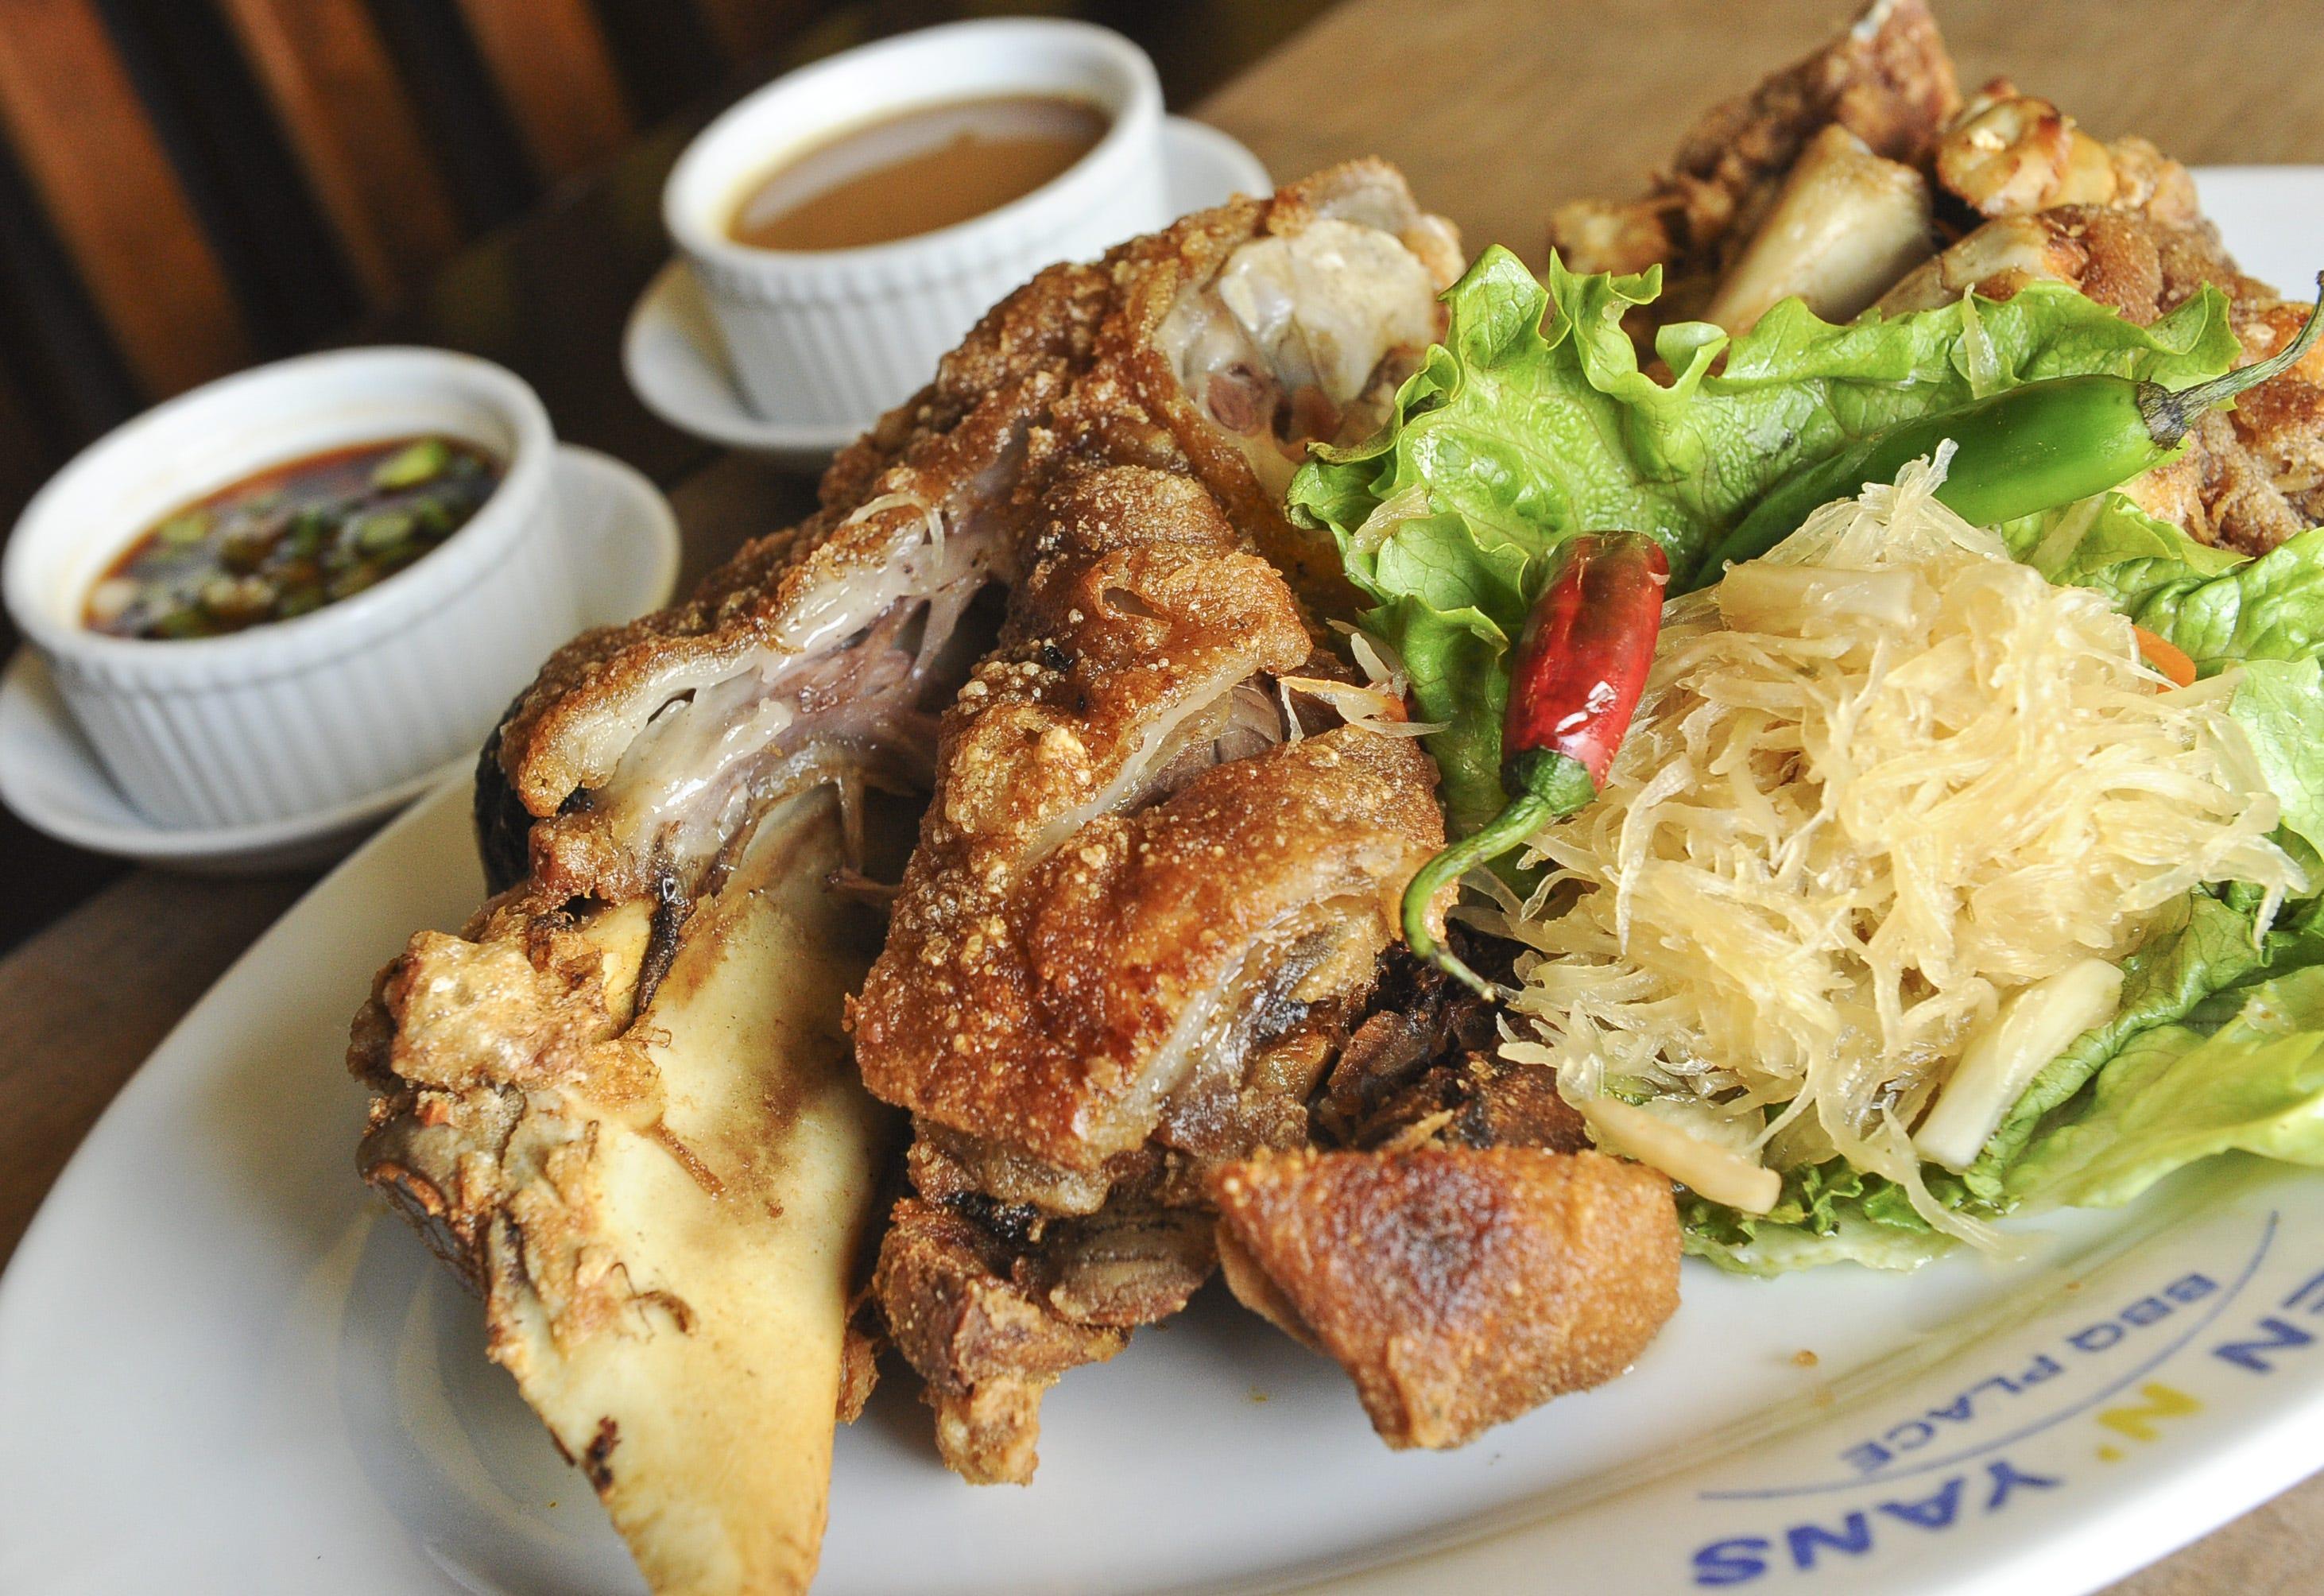 A house favorite, crispy pata, prepared at Ben n' Yan's restaurant. Crispy pata is deep-fried pork knuckles.